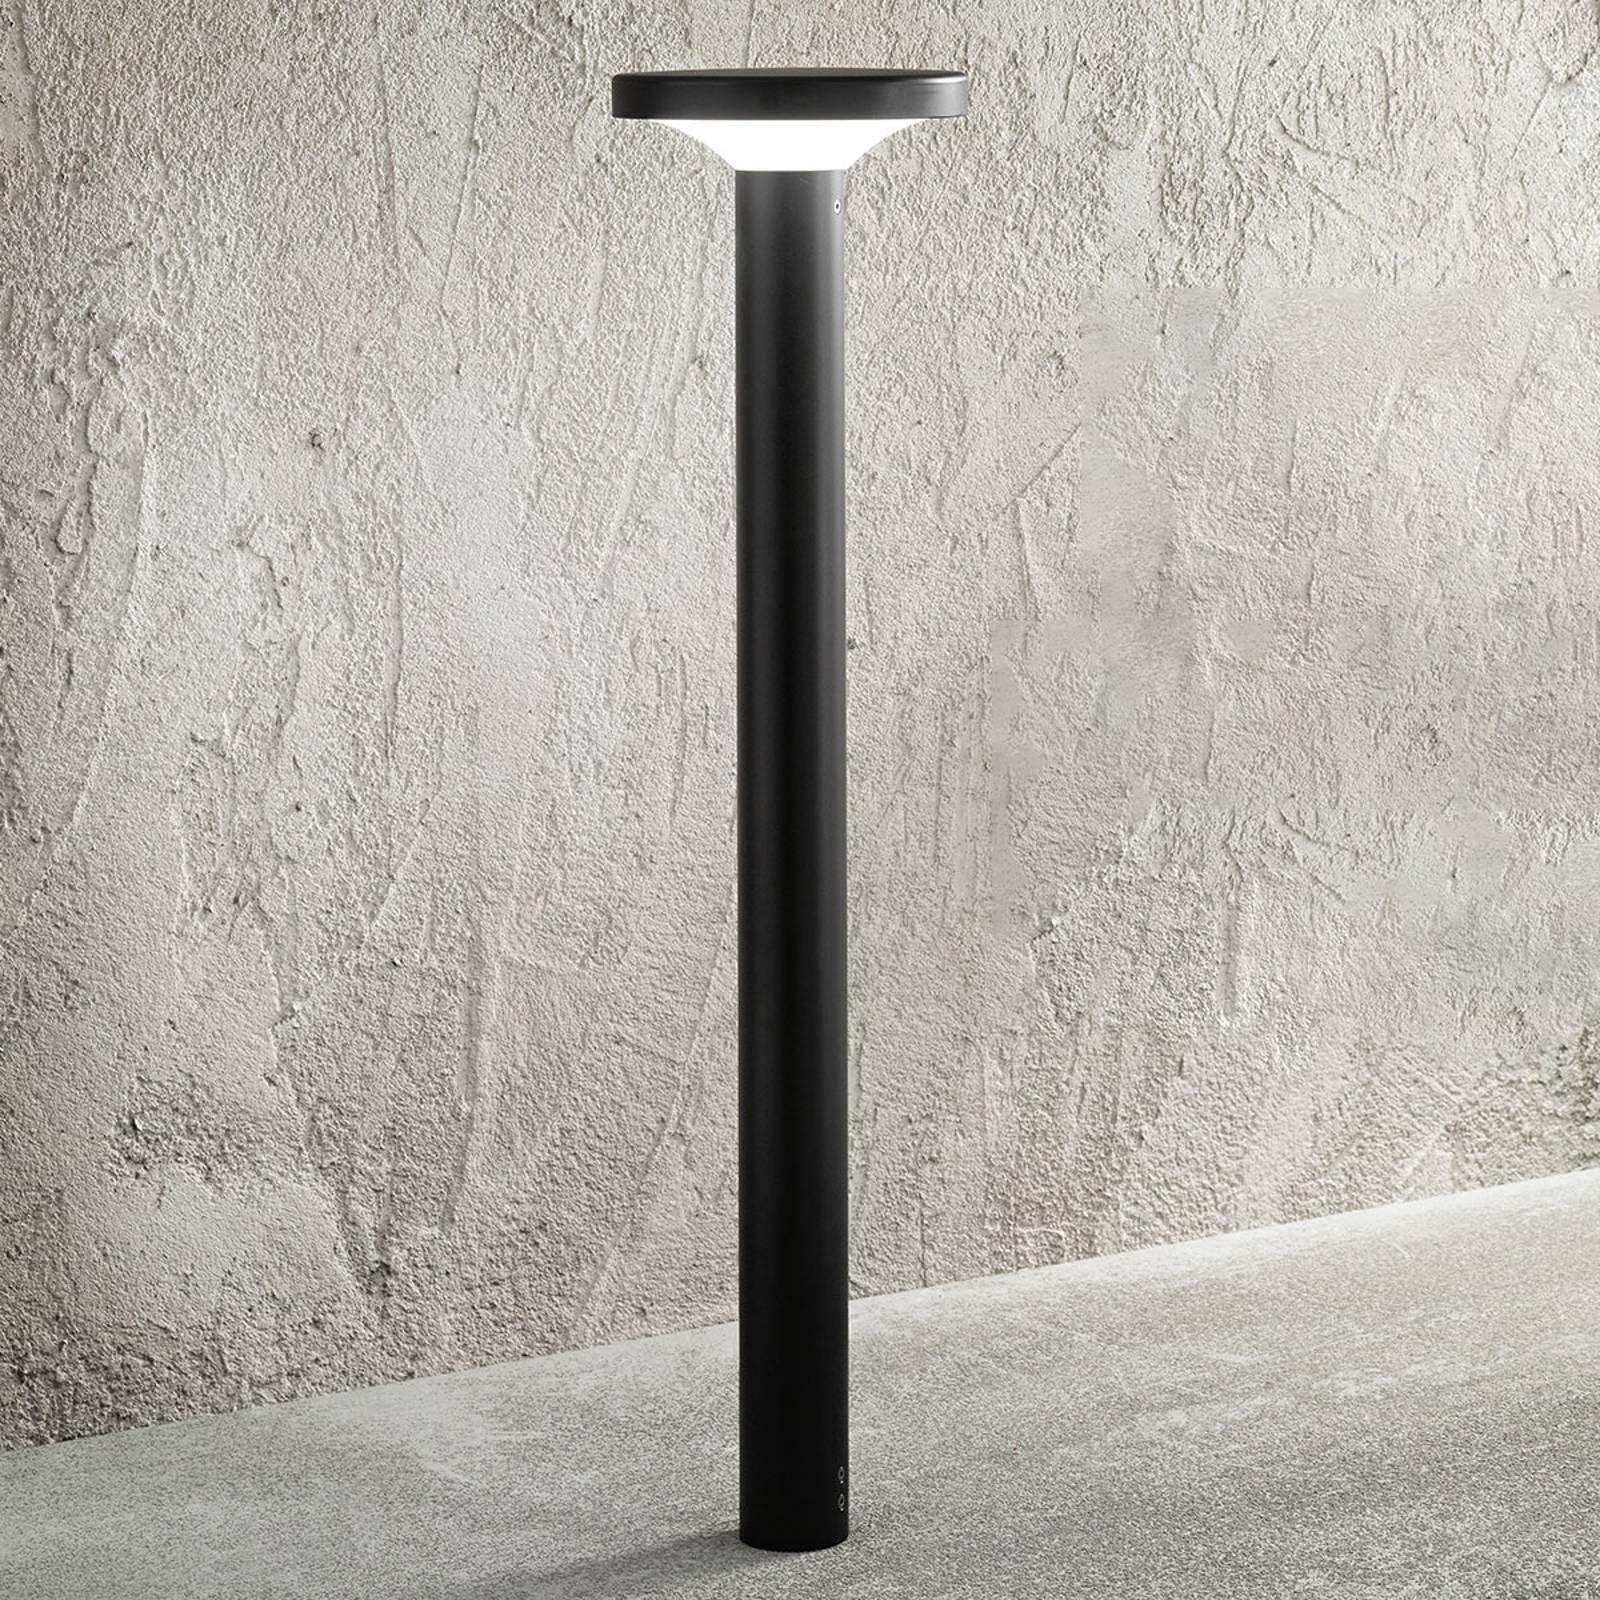 LED-pylväsvalaisin MyWhite_Bond, moderni musta